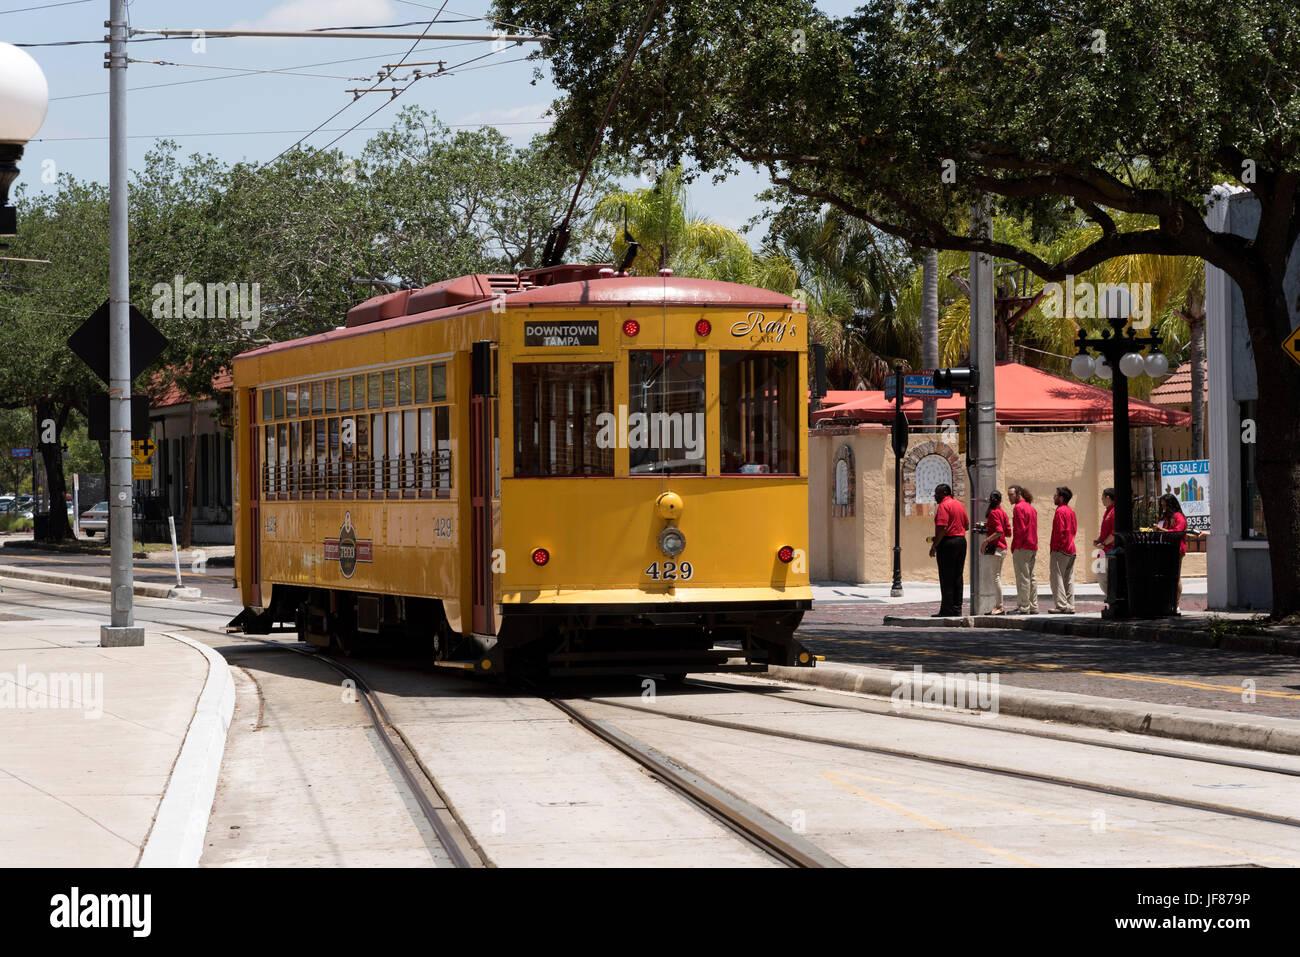 Teco Line streetcar in Ybor City the historic district of Tampa Florida USA. Circa 2017 - Stock Image